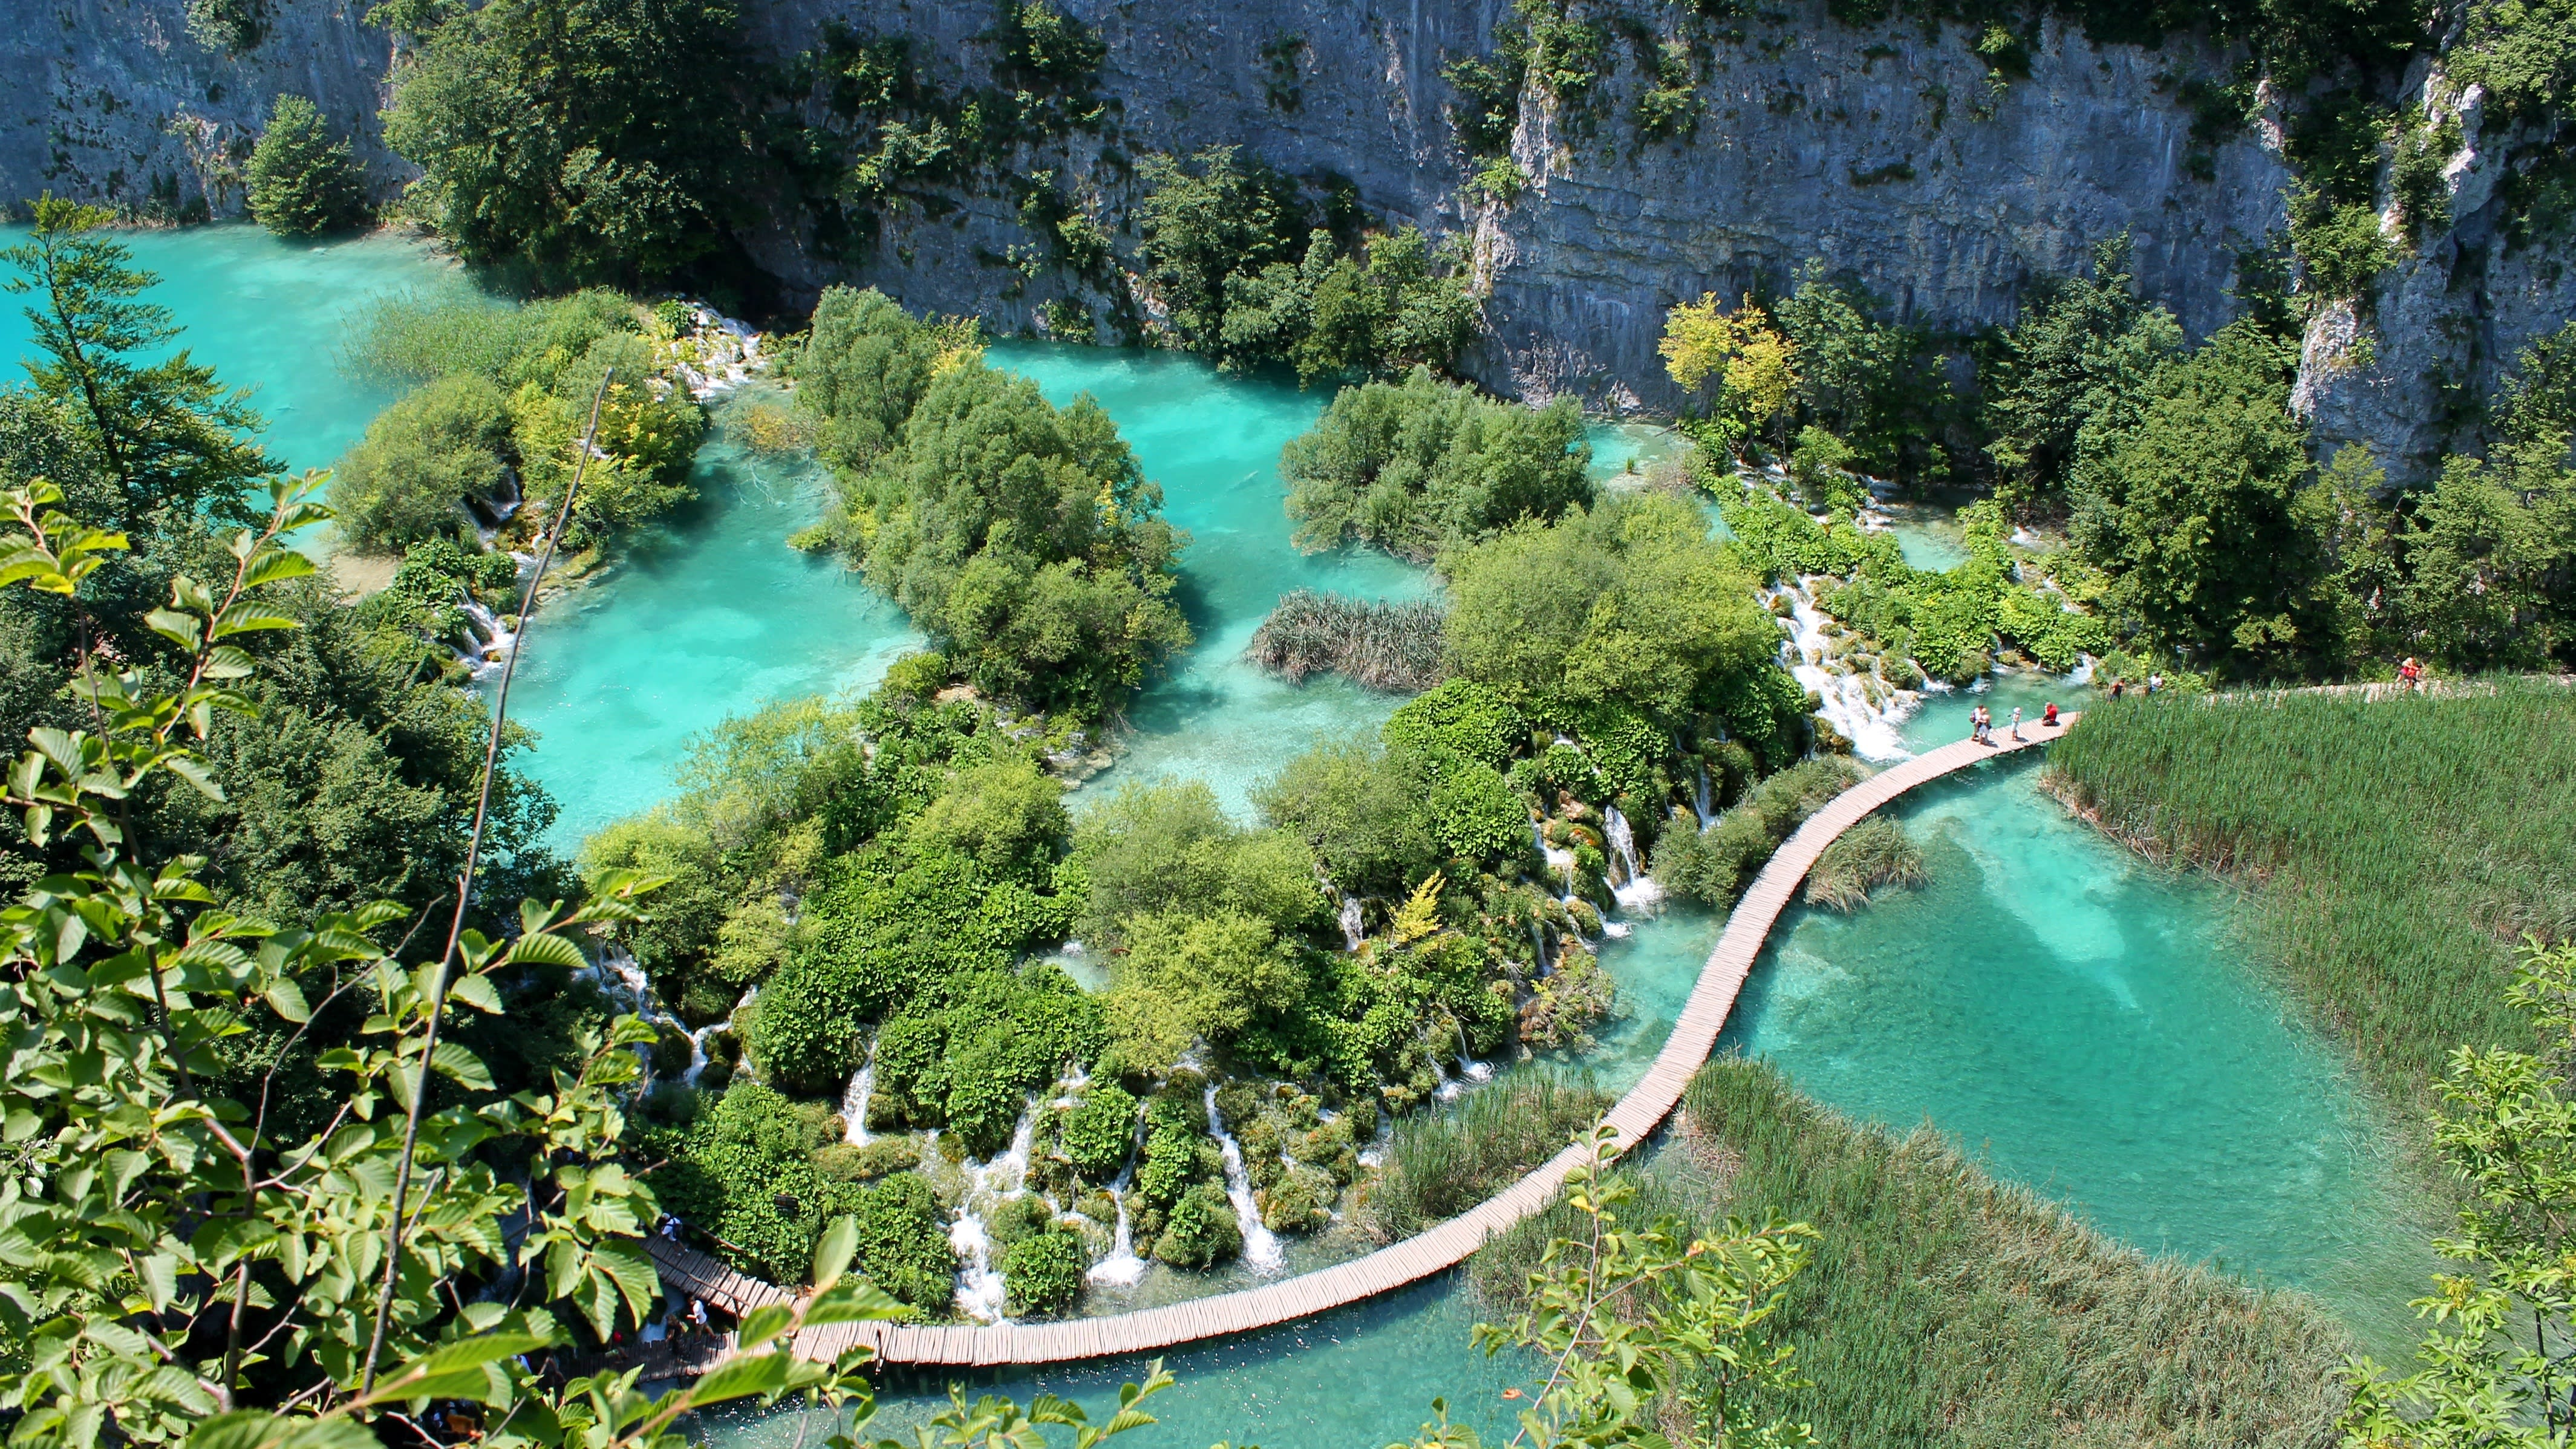 Plitvice Lakes National Park Game of Thrones Sailing destinations Croatia